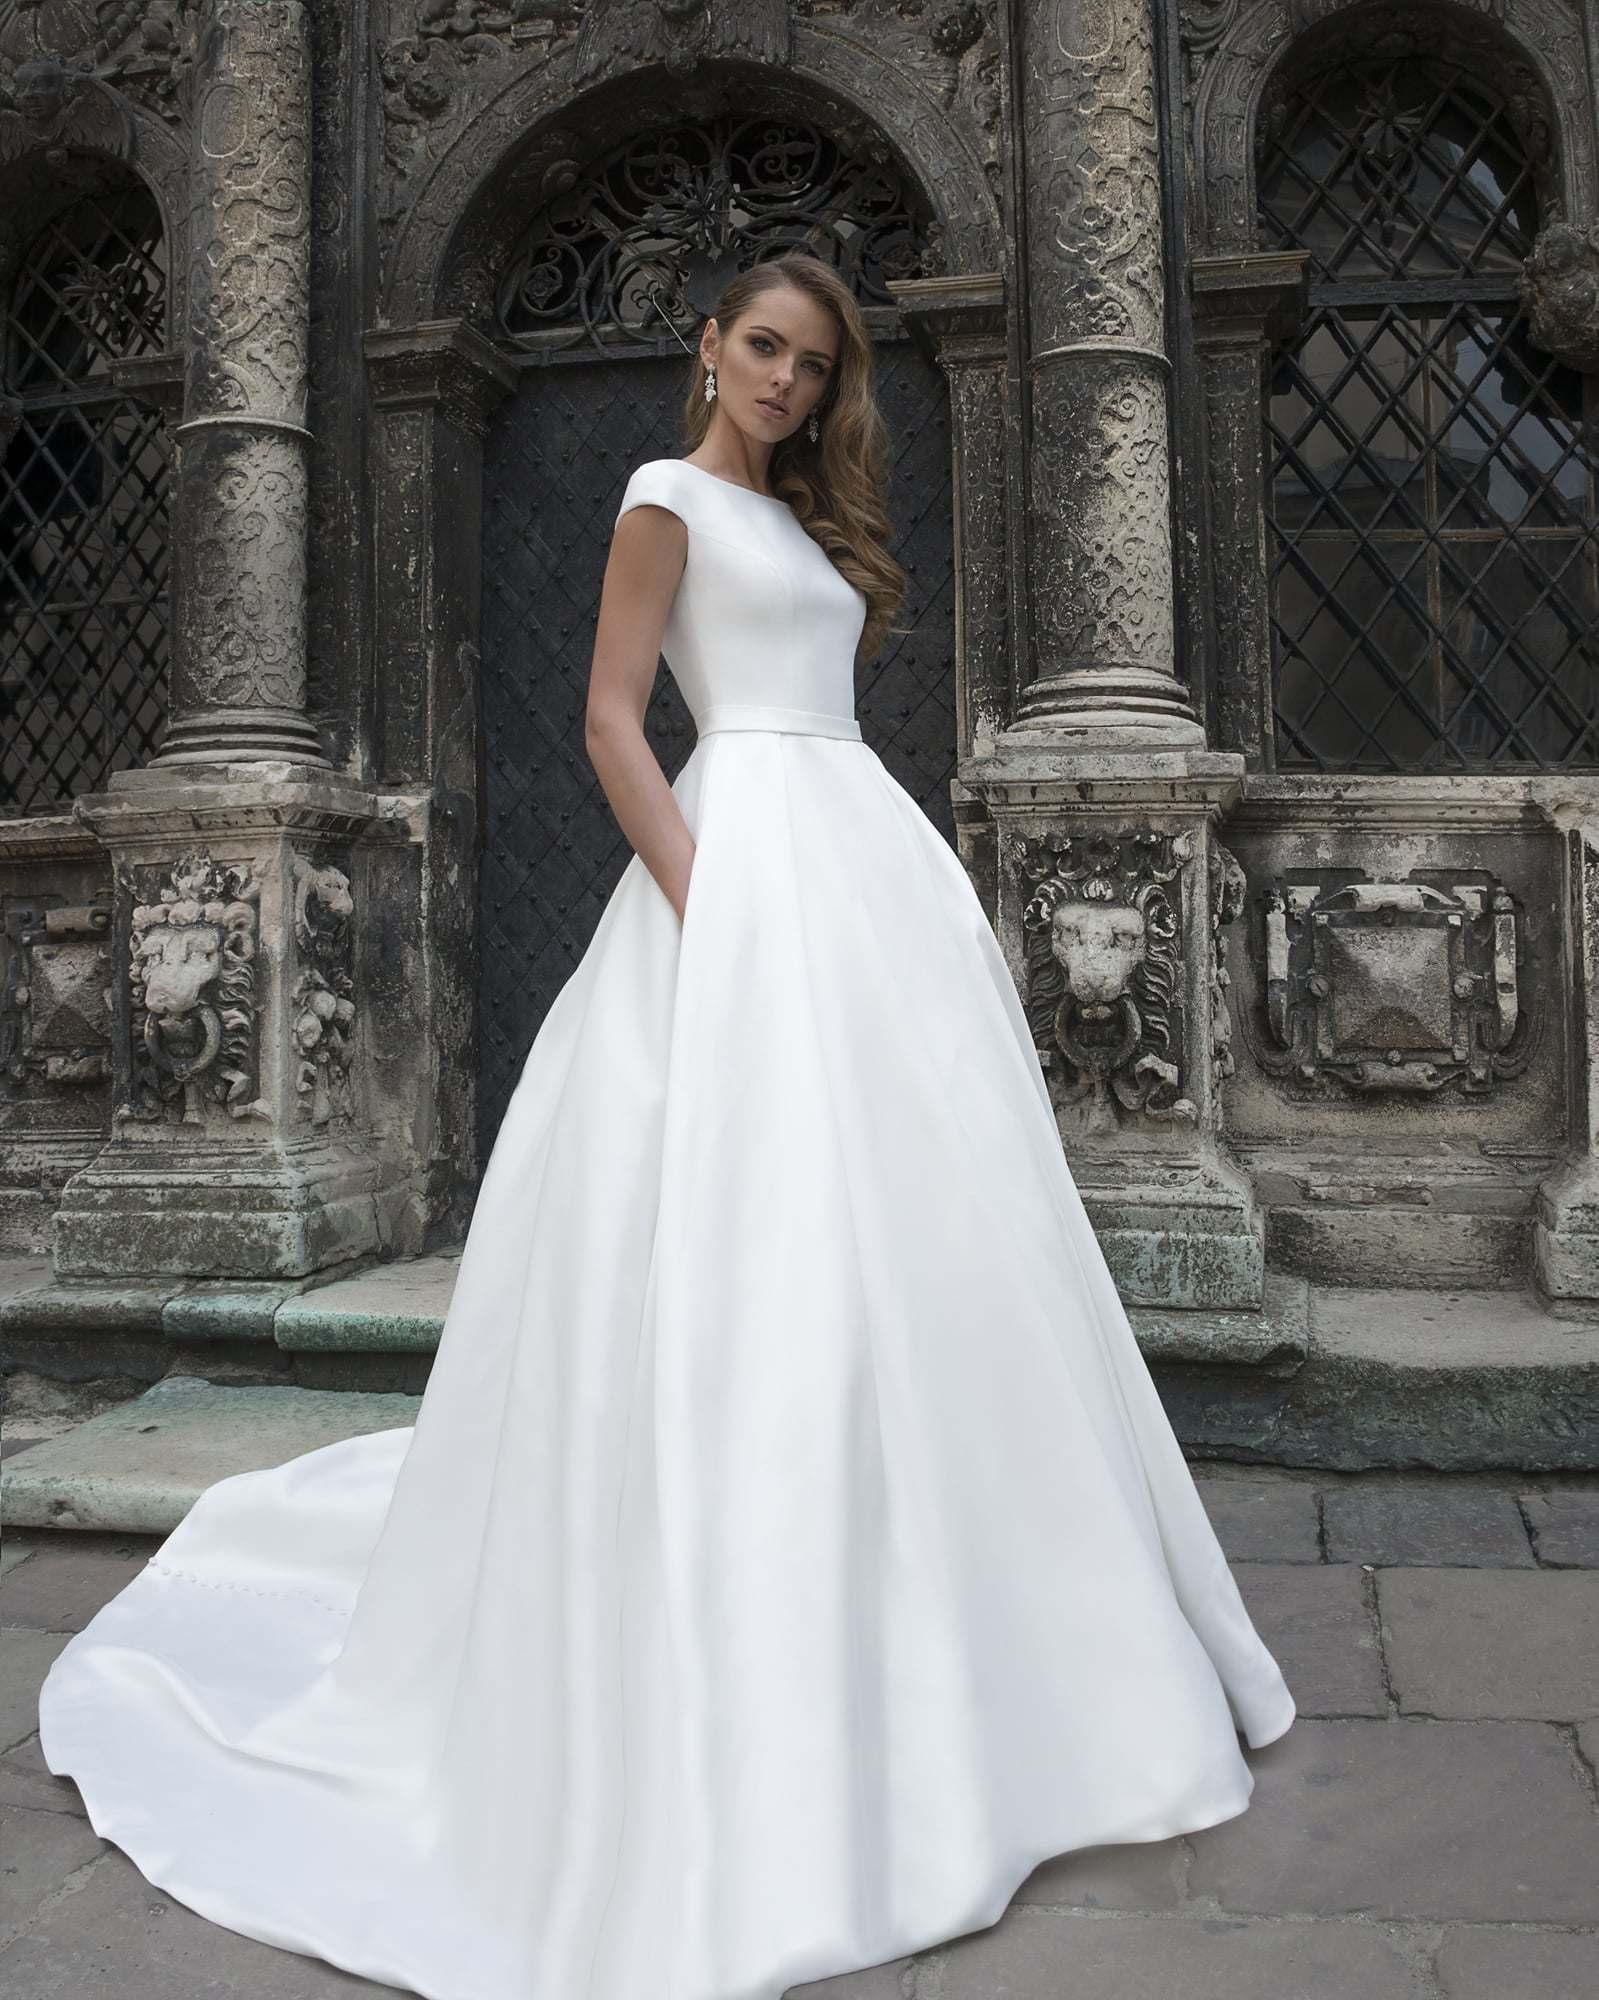 Wedding Dress With Pockets.Hot Item Amelie Rocky A Line Vintage Satin Wedding Dresses With Pockets